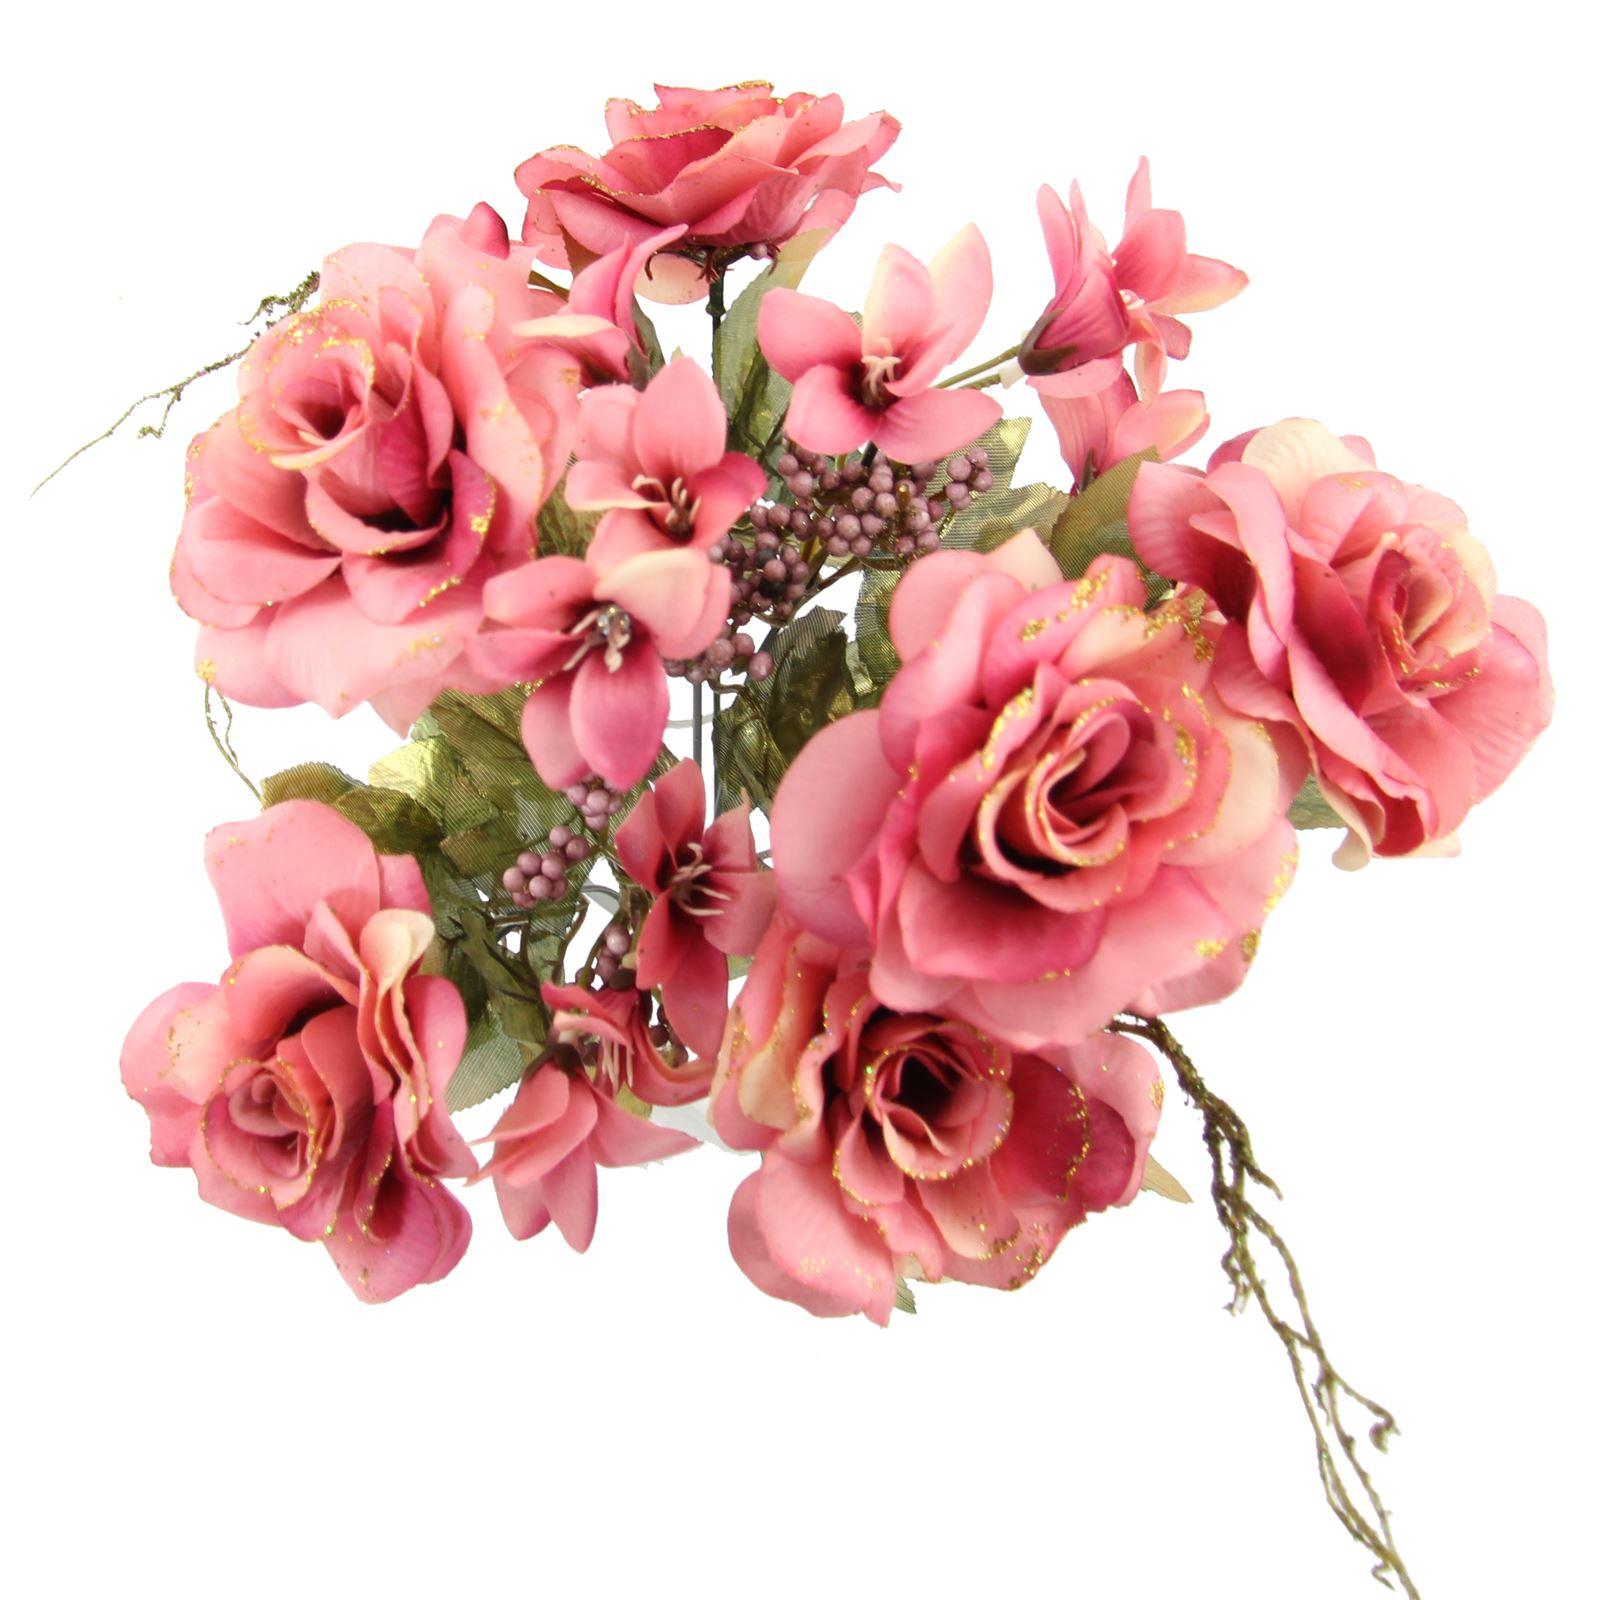 Rose and alstroemeria glitter bouquet artificial silk flowers rose and alstroemeria glitter bouquet artificial silk flowers izmirmasajfo